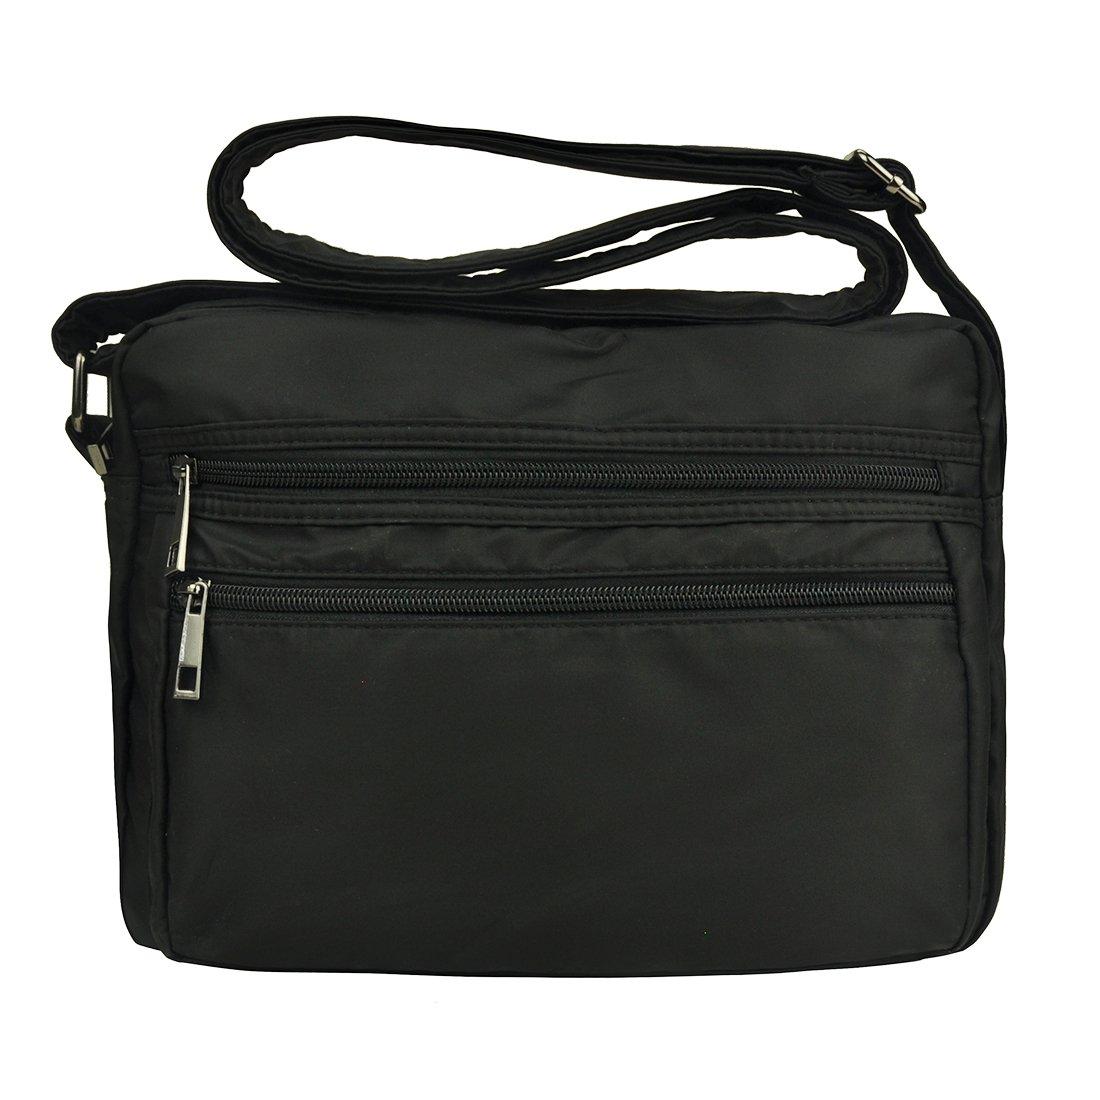 Multi Pocket Nylon Crossbody Bag Lightweight Purses and Handbags Pocketbooks Messenger Bags for Men and Women